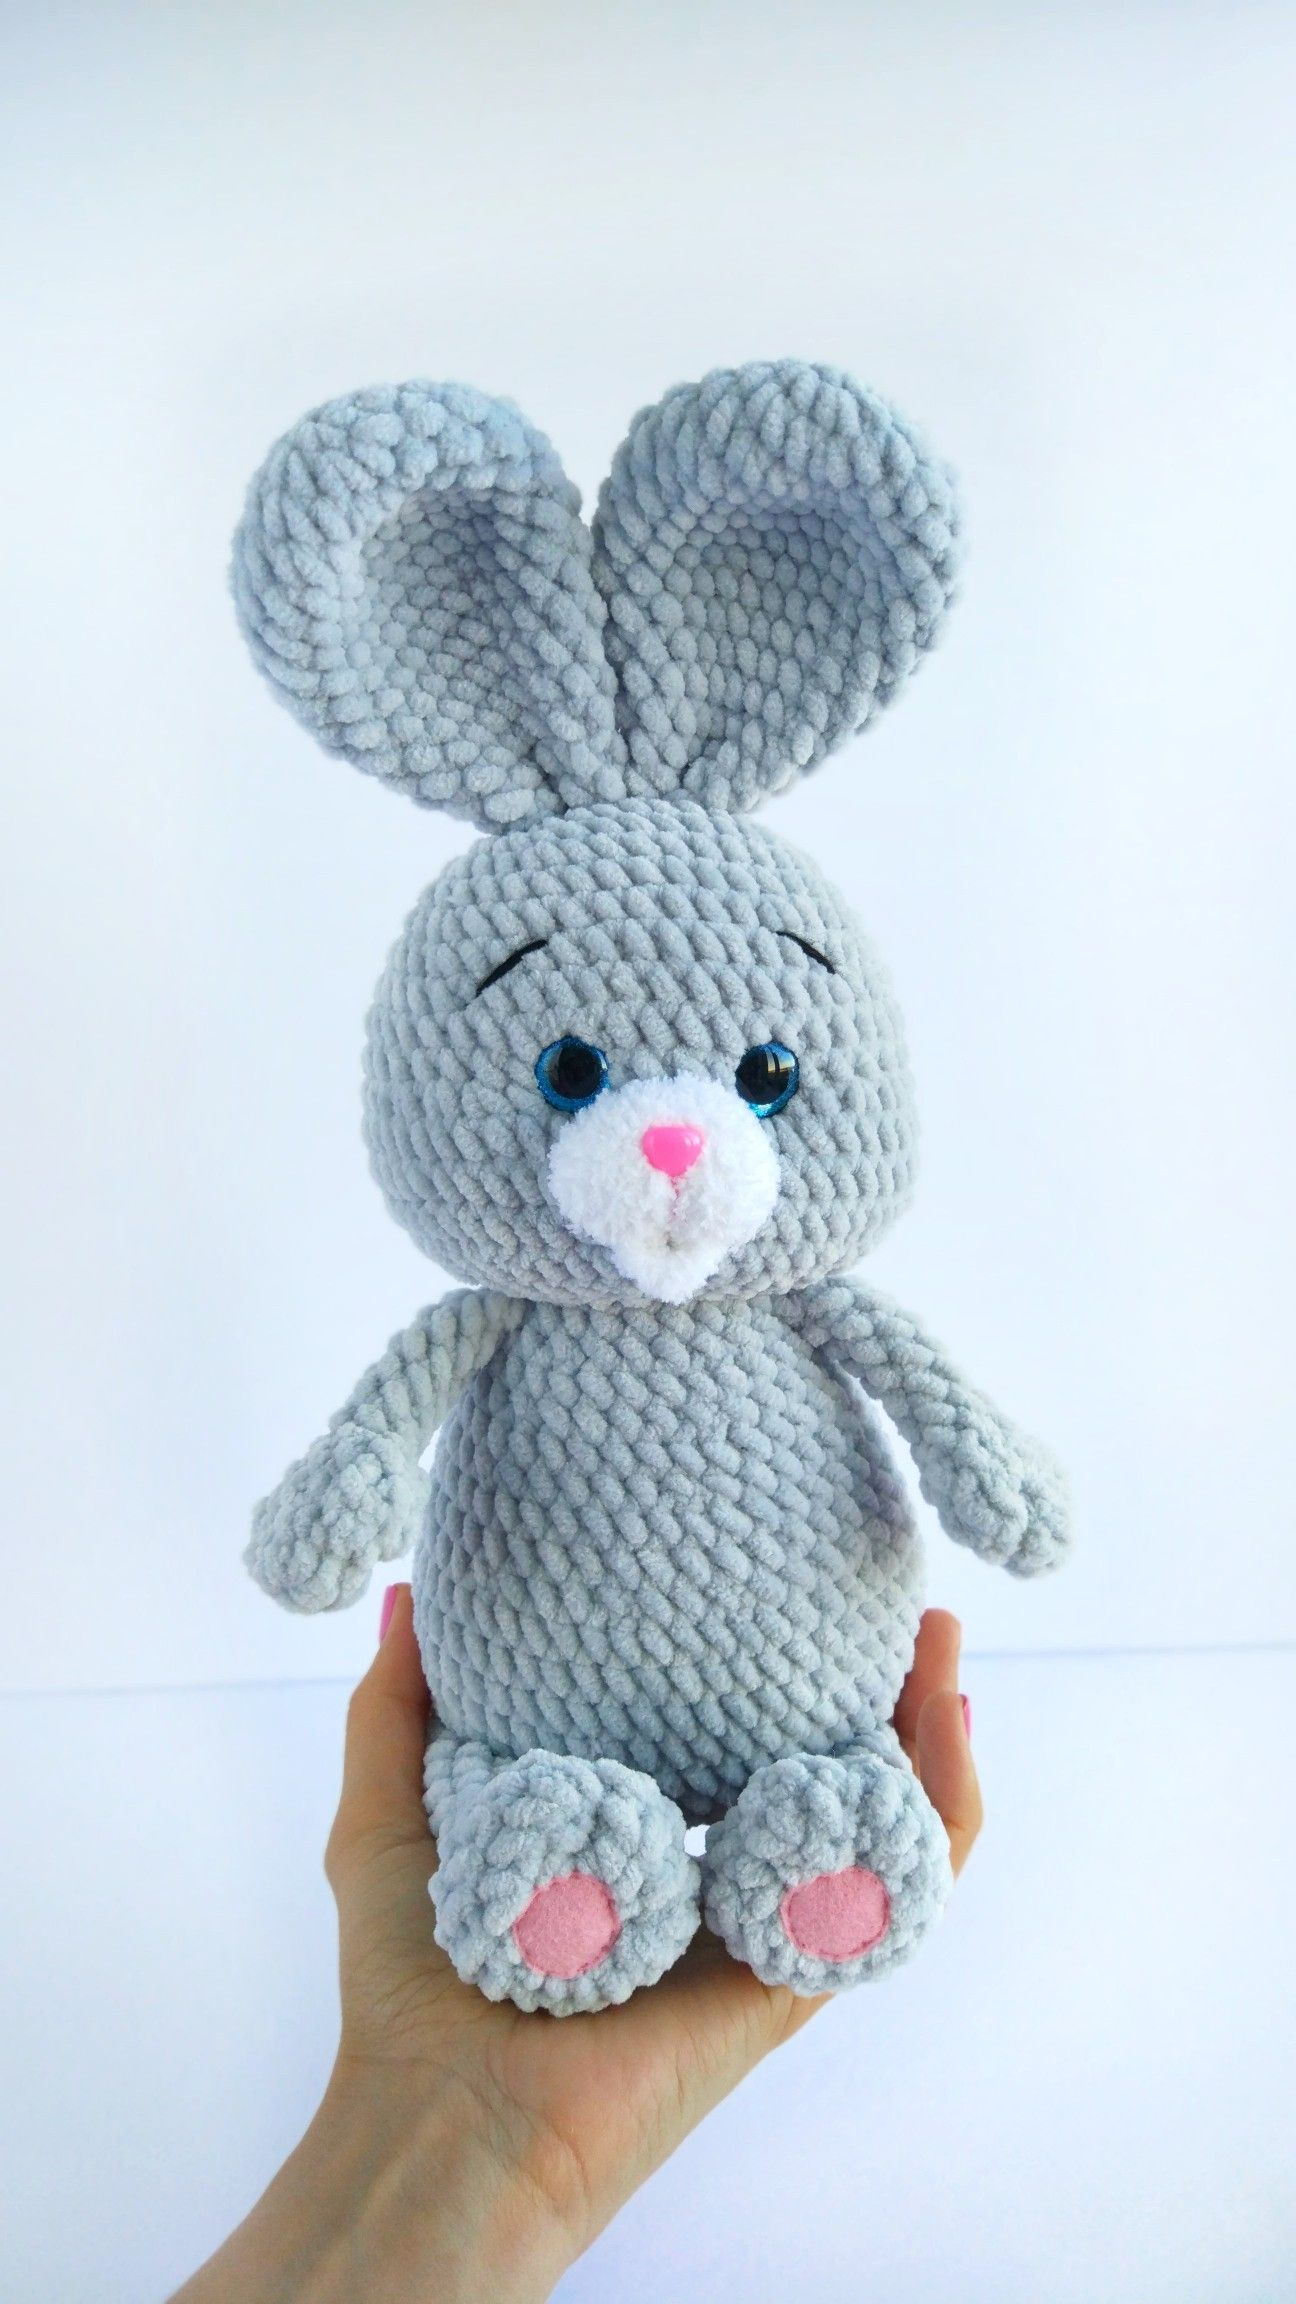 Big Handmade 15'' Knit Amigurumi Rabbit,Crochet Toy,Handmade ... | 2304x1296